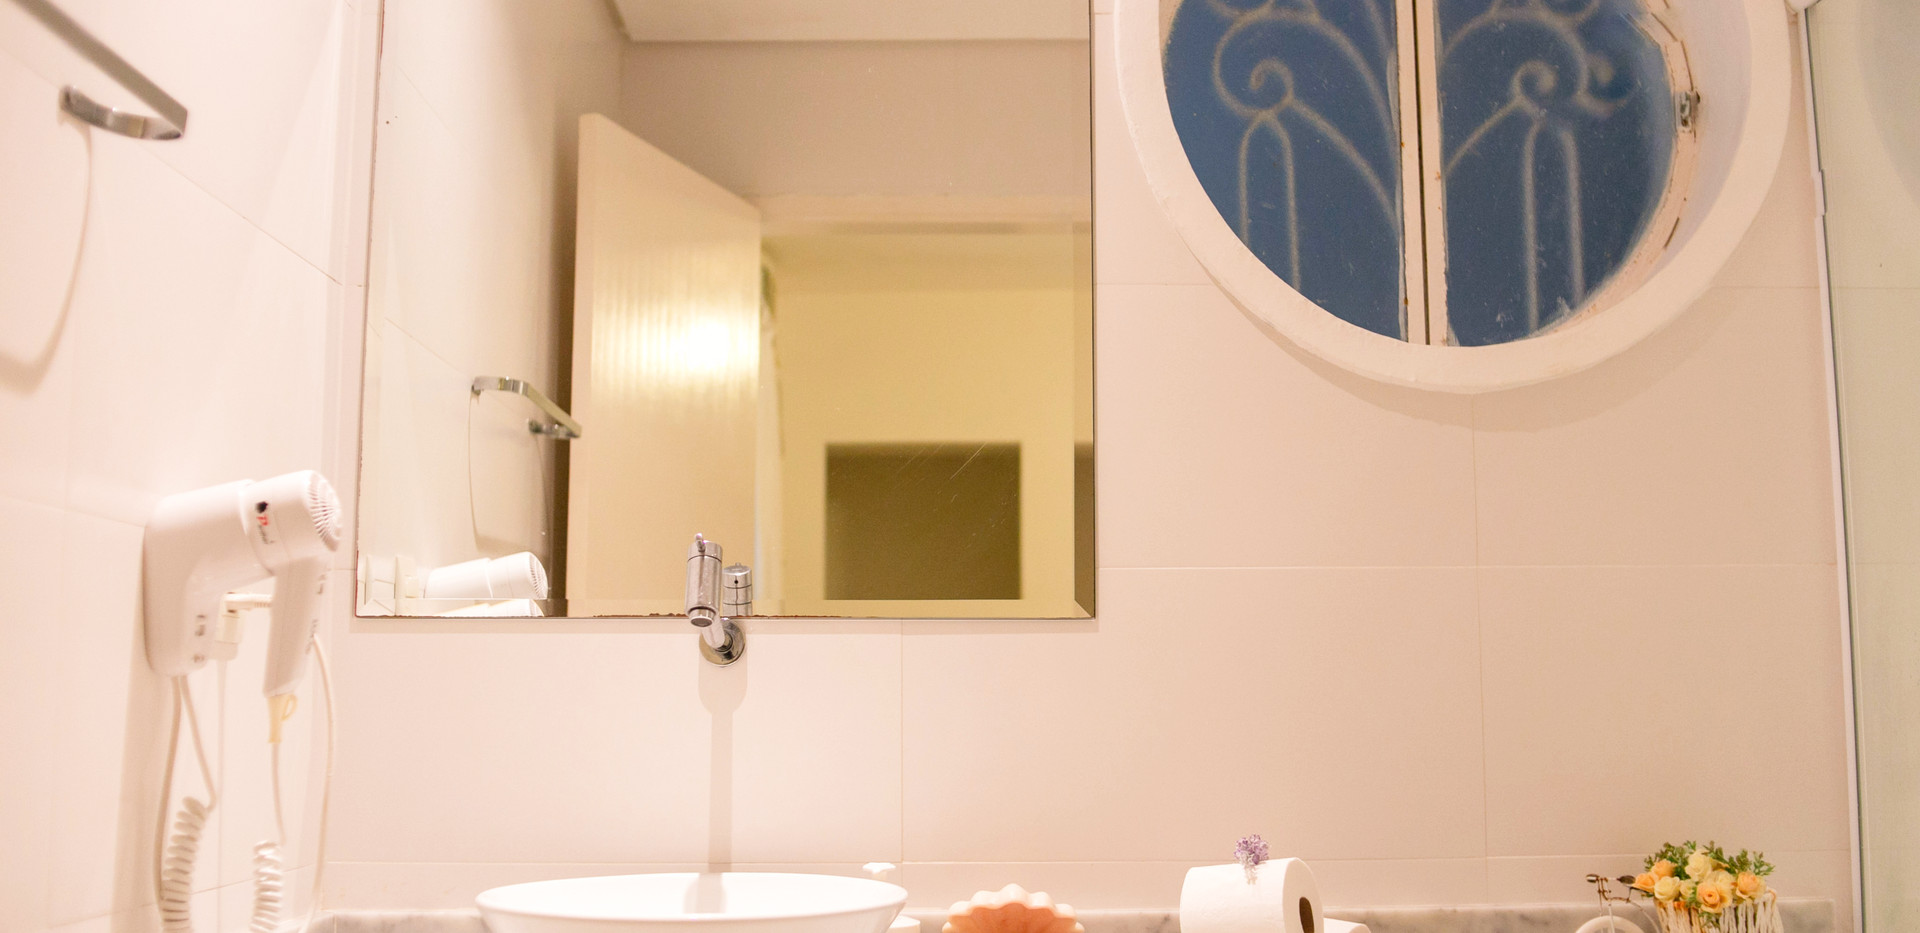 Banheiro Morango